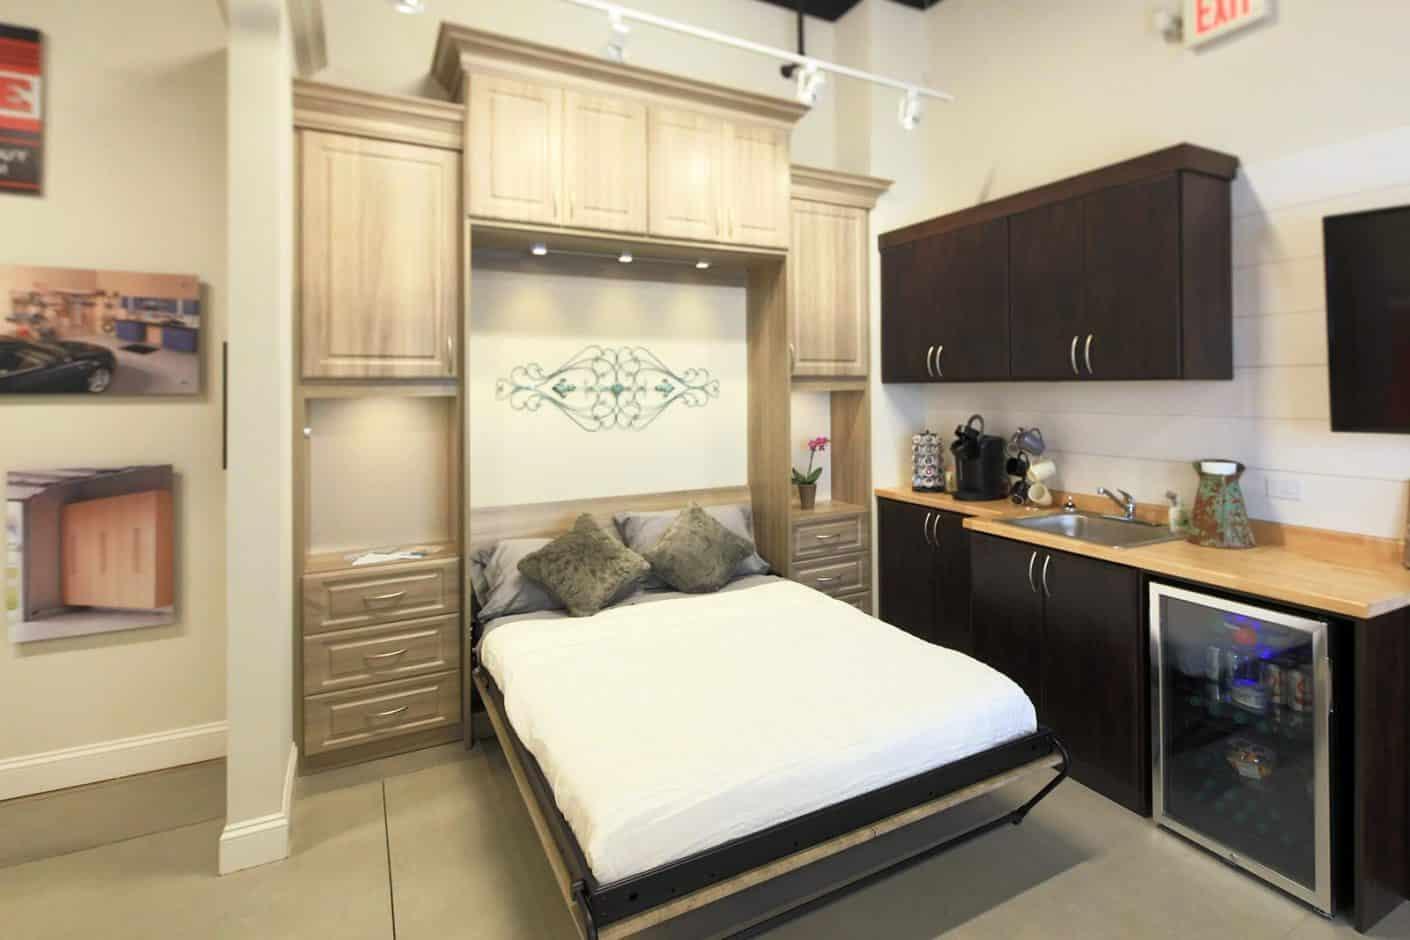 Attirant Custom Closets And Whole Home Organization | SC | NC